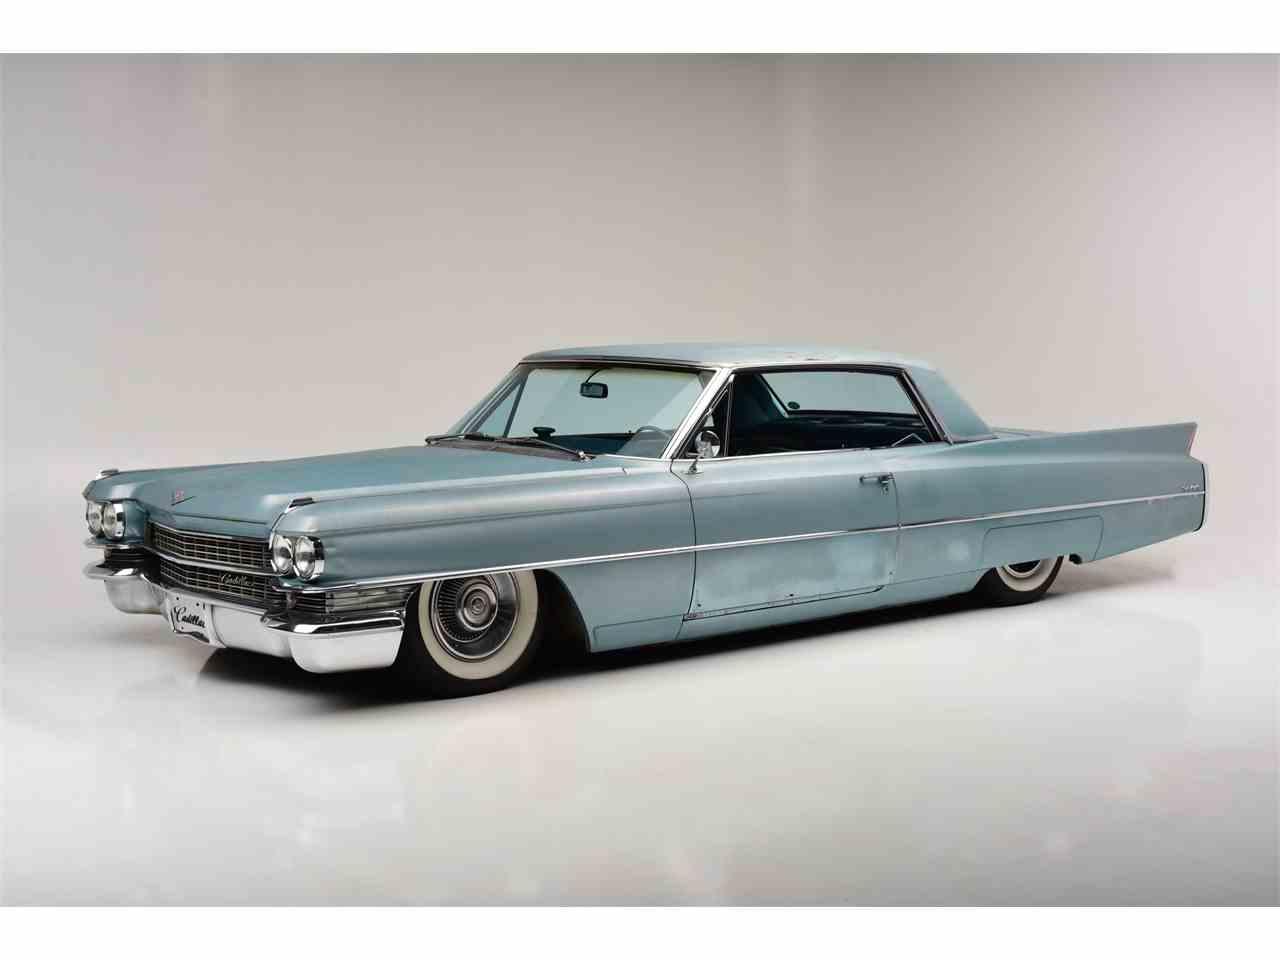 1963 Cadillac Coupe Deville For Sale Classiccars Com